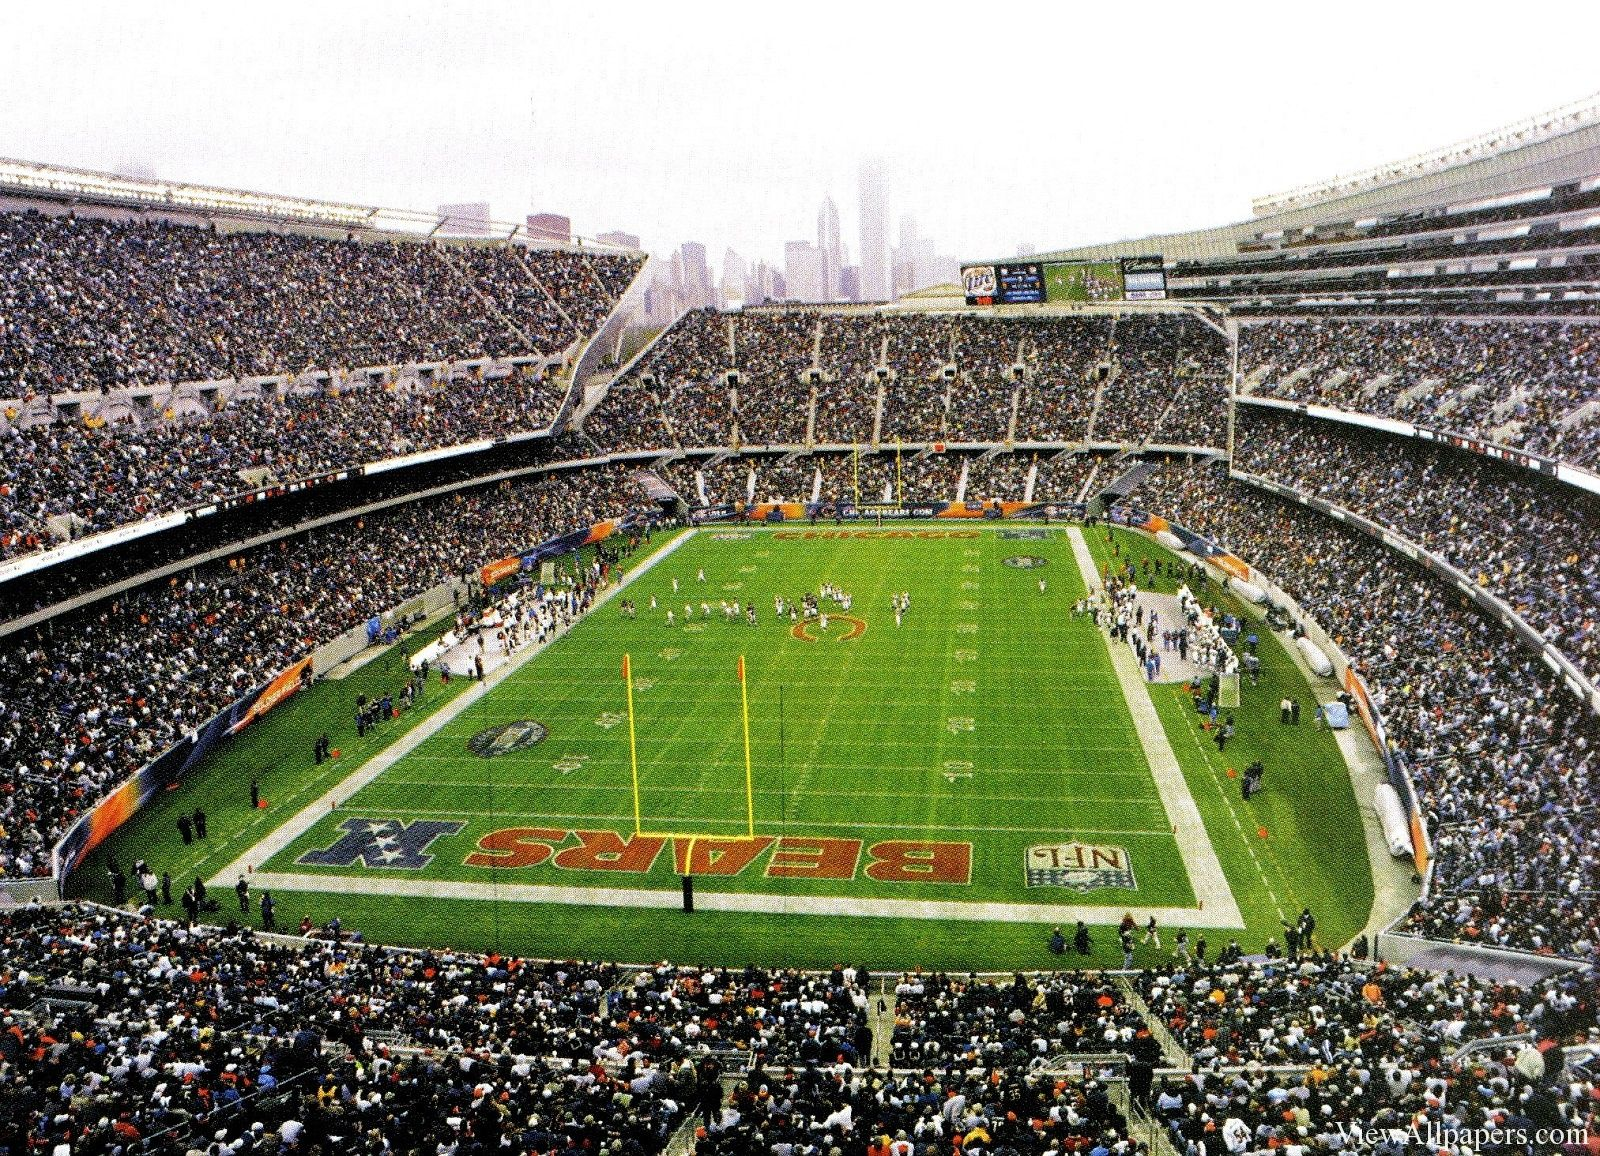 Chicago Bears Stadium Nfl Hd Wallpapers Chicago Bears Wallpaper Chicago Bears Stadium Soldier Field